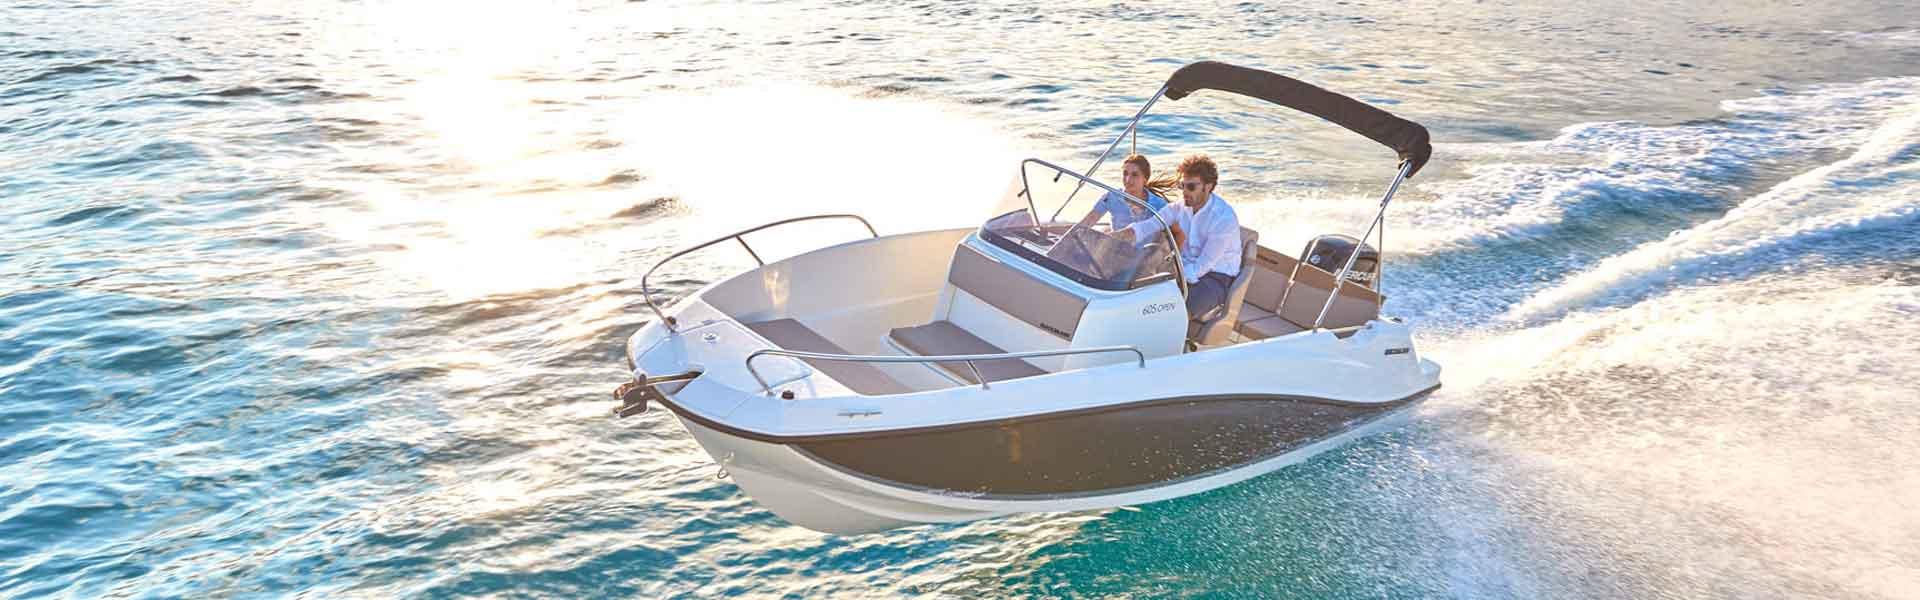 romantic boat rental